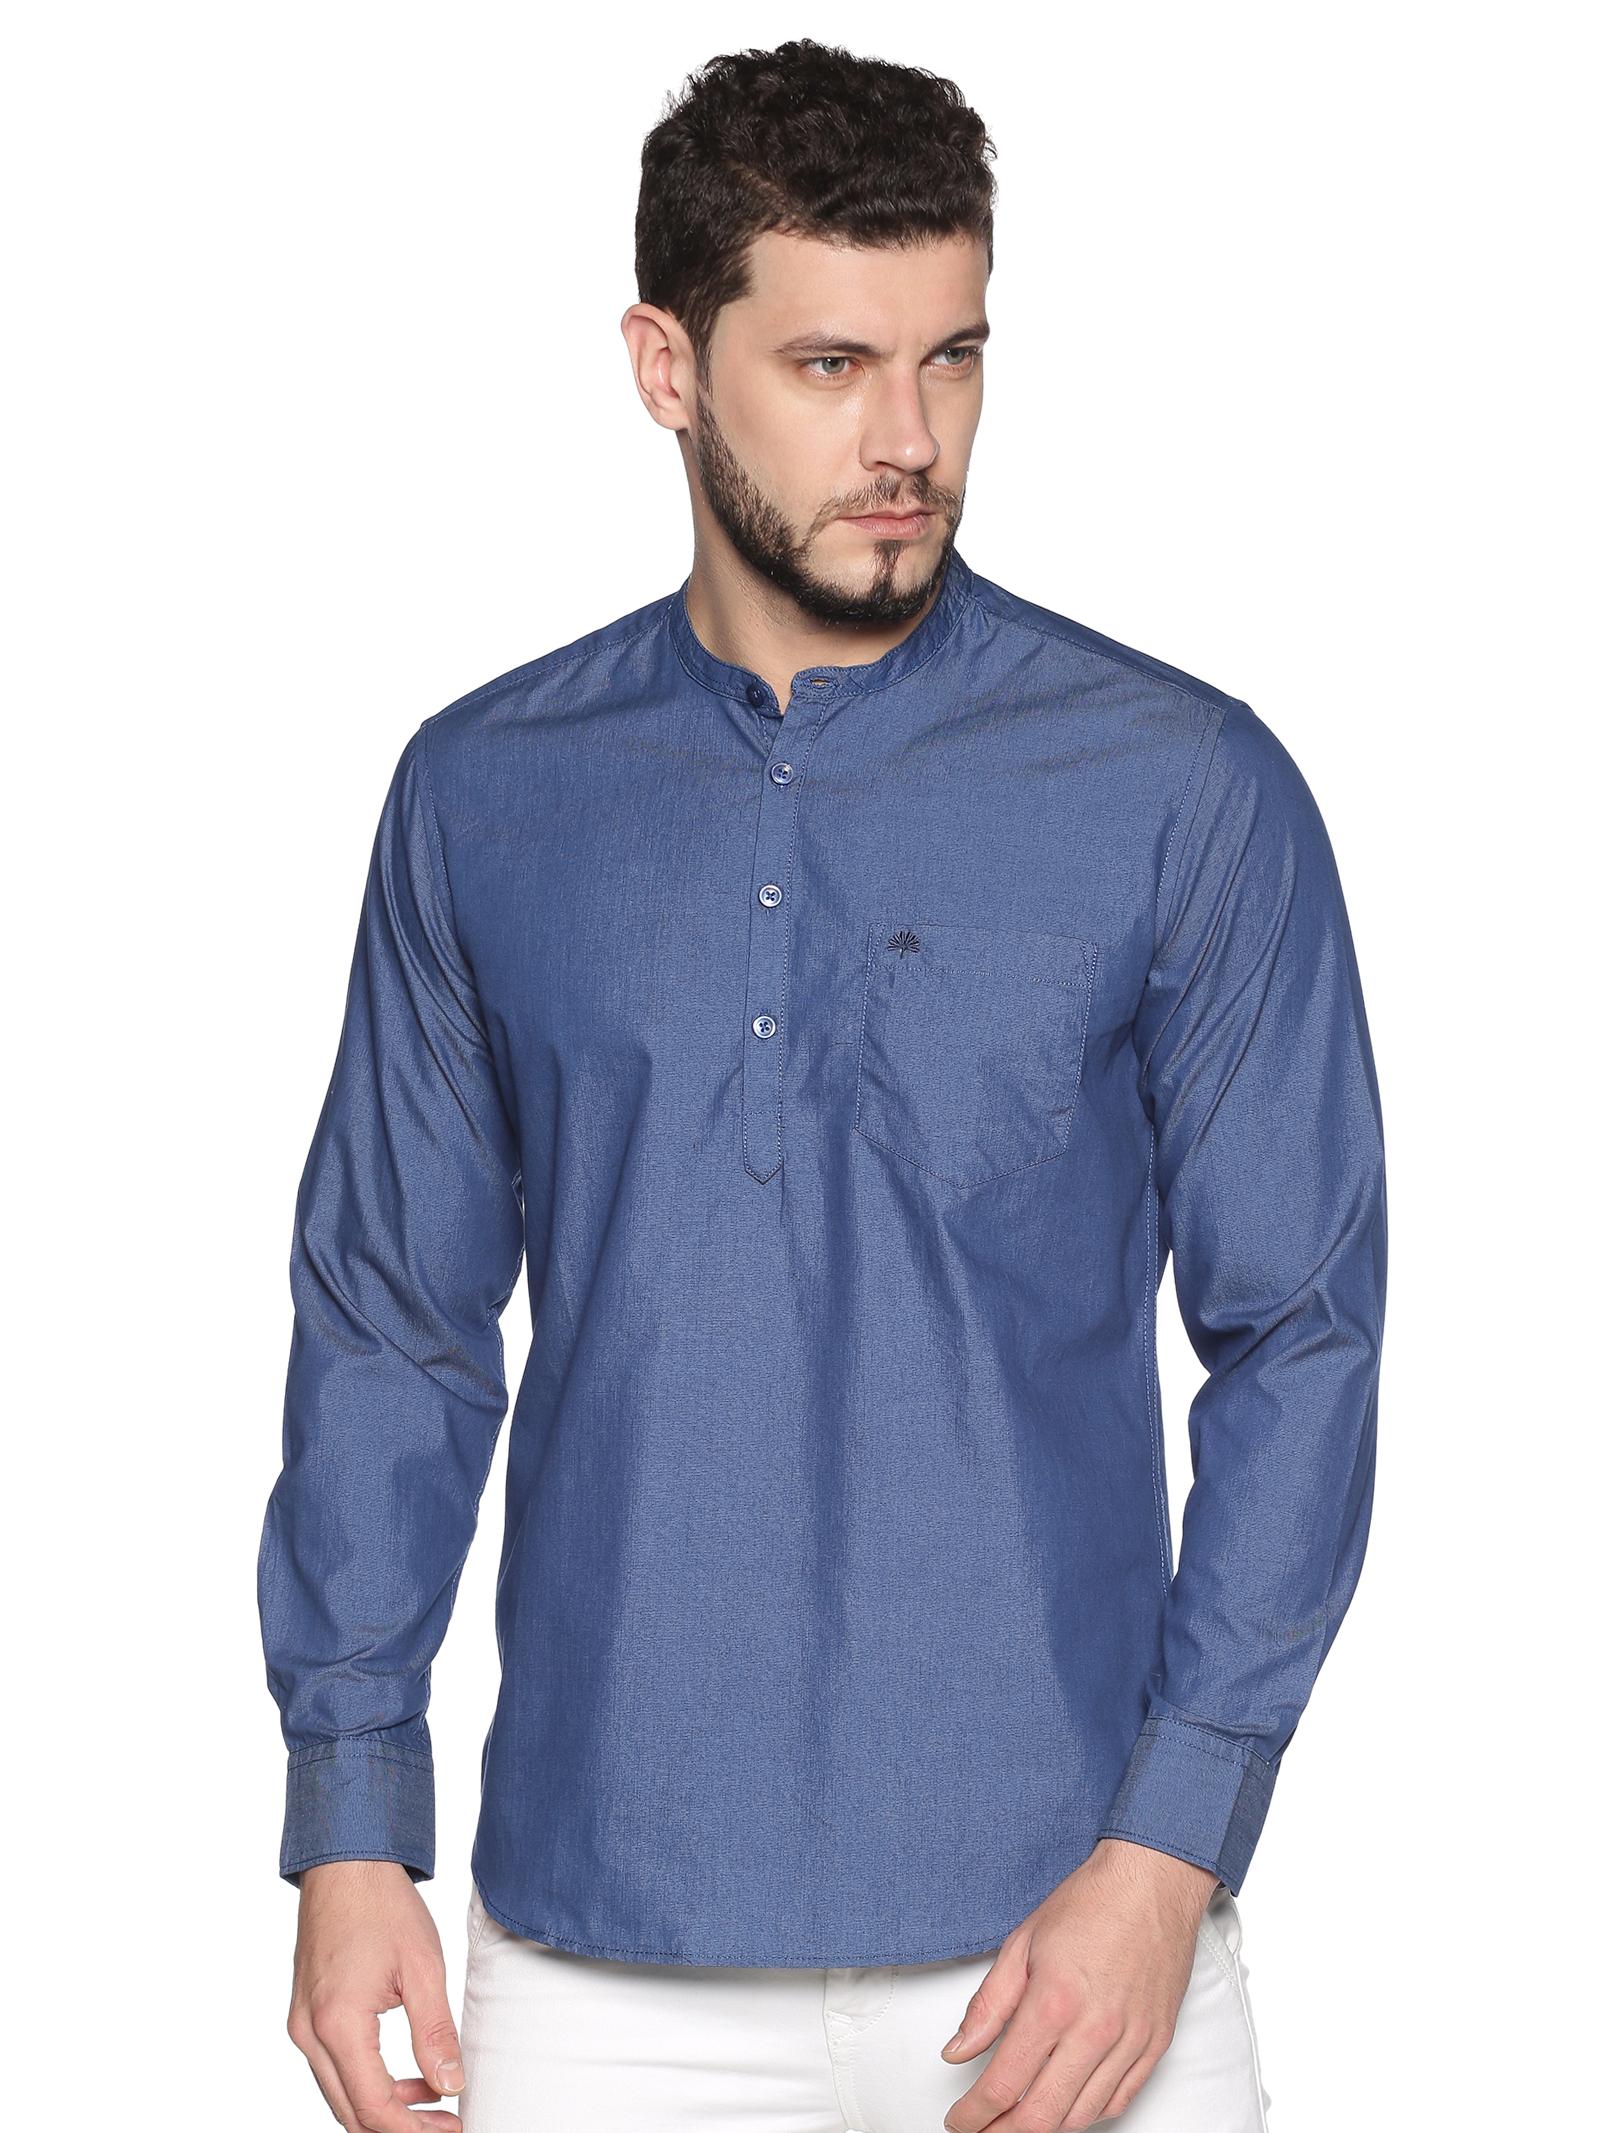 Chennis | Chennis Men's Navy Blue Casual Cotton Kurta